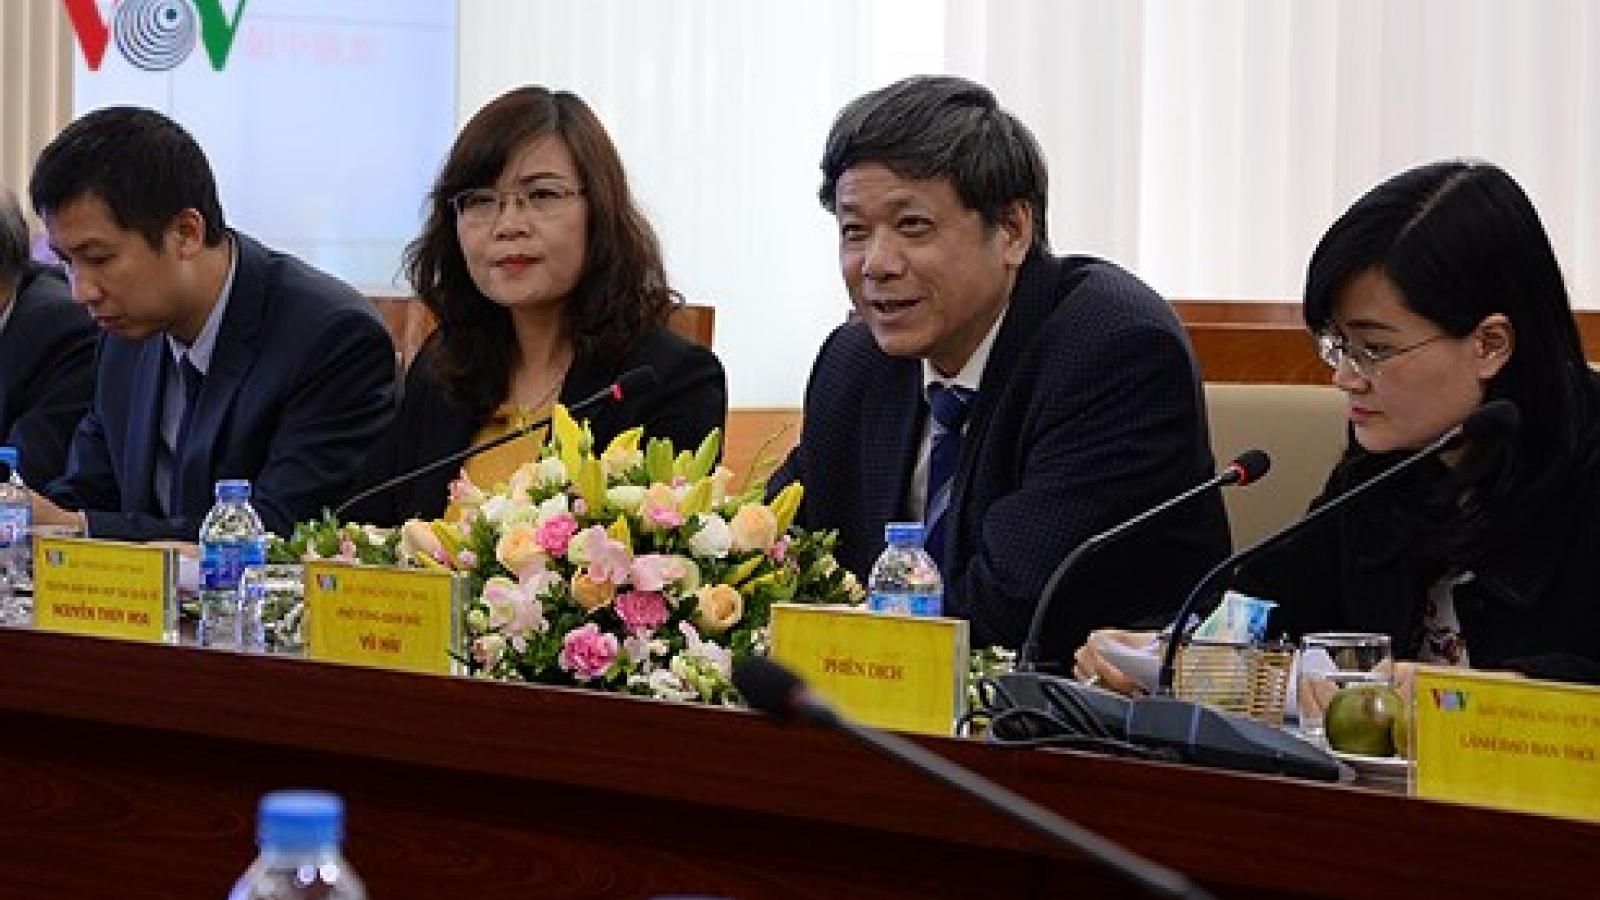 VOV, Guangxi Radio Station partner for TV programs